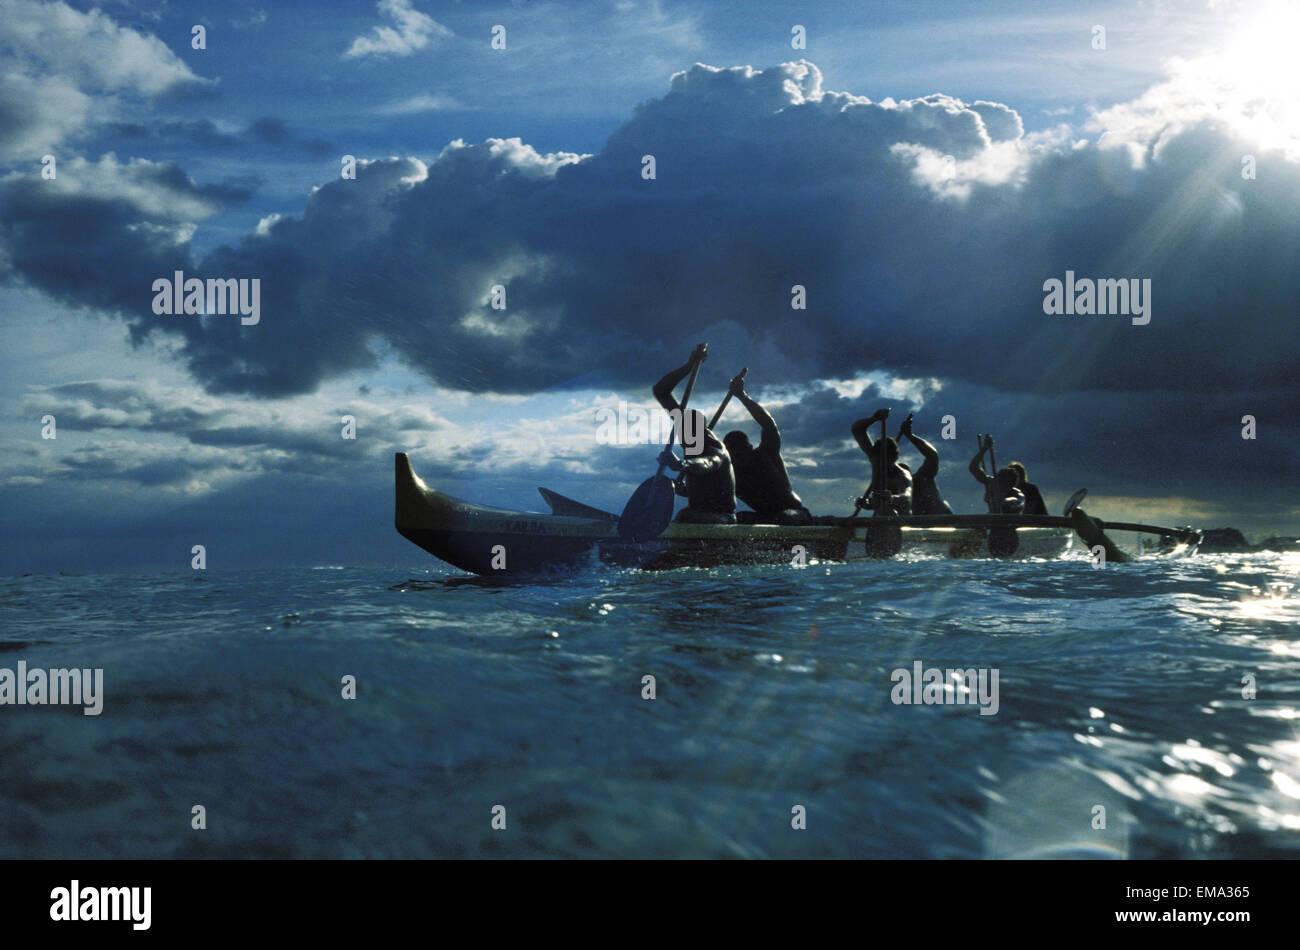 Hawaii, Ourigger Canoe Paddlers At Sunset, Rays Of Light Break Through Dramatic Sky Stock Photo